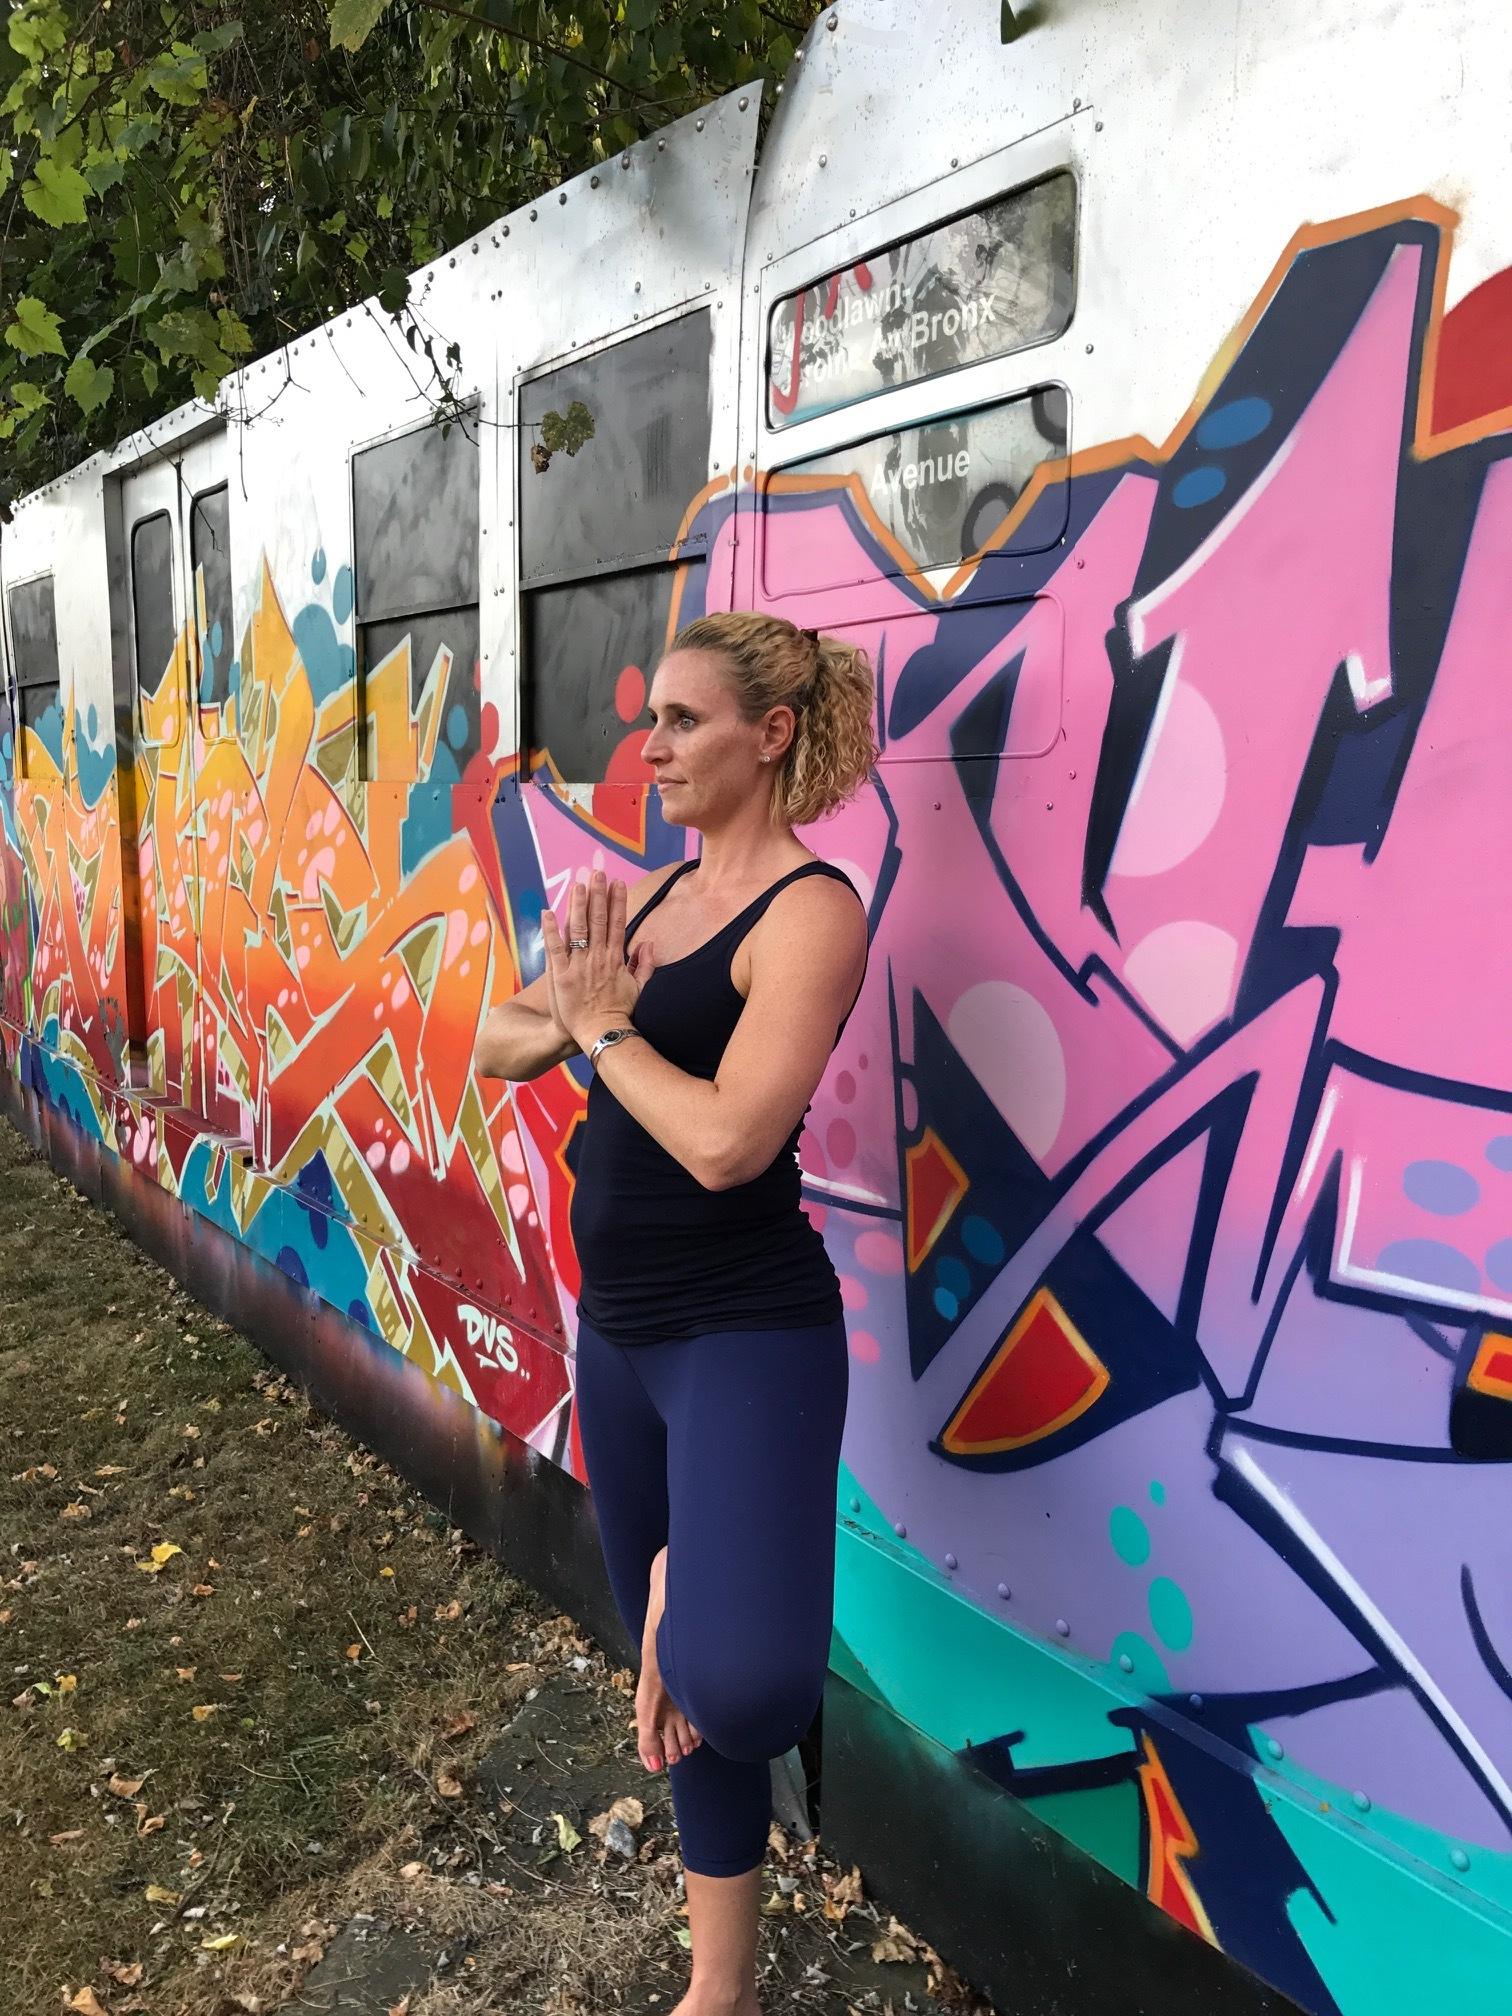 Power Yoga Flow To Hip Hop Playlist Saturday February 10th 4 30 Pm Empower Yoga